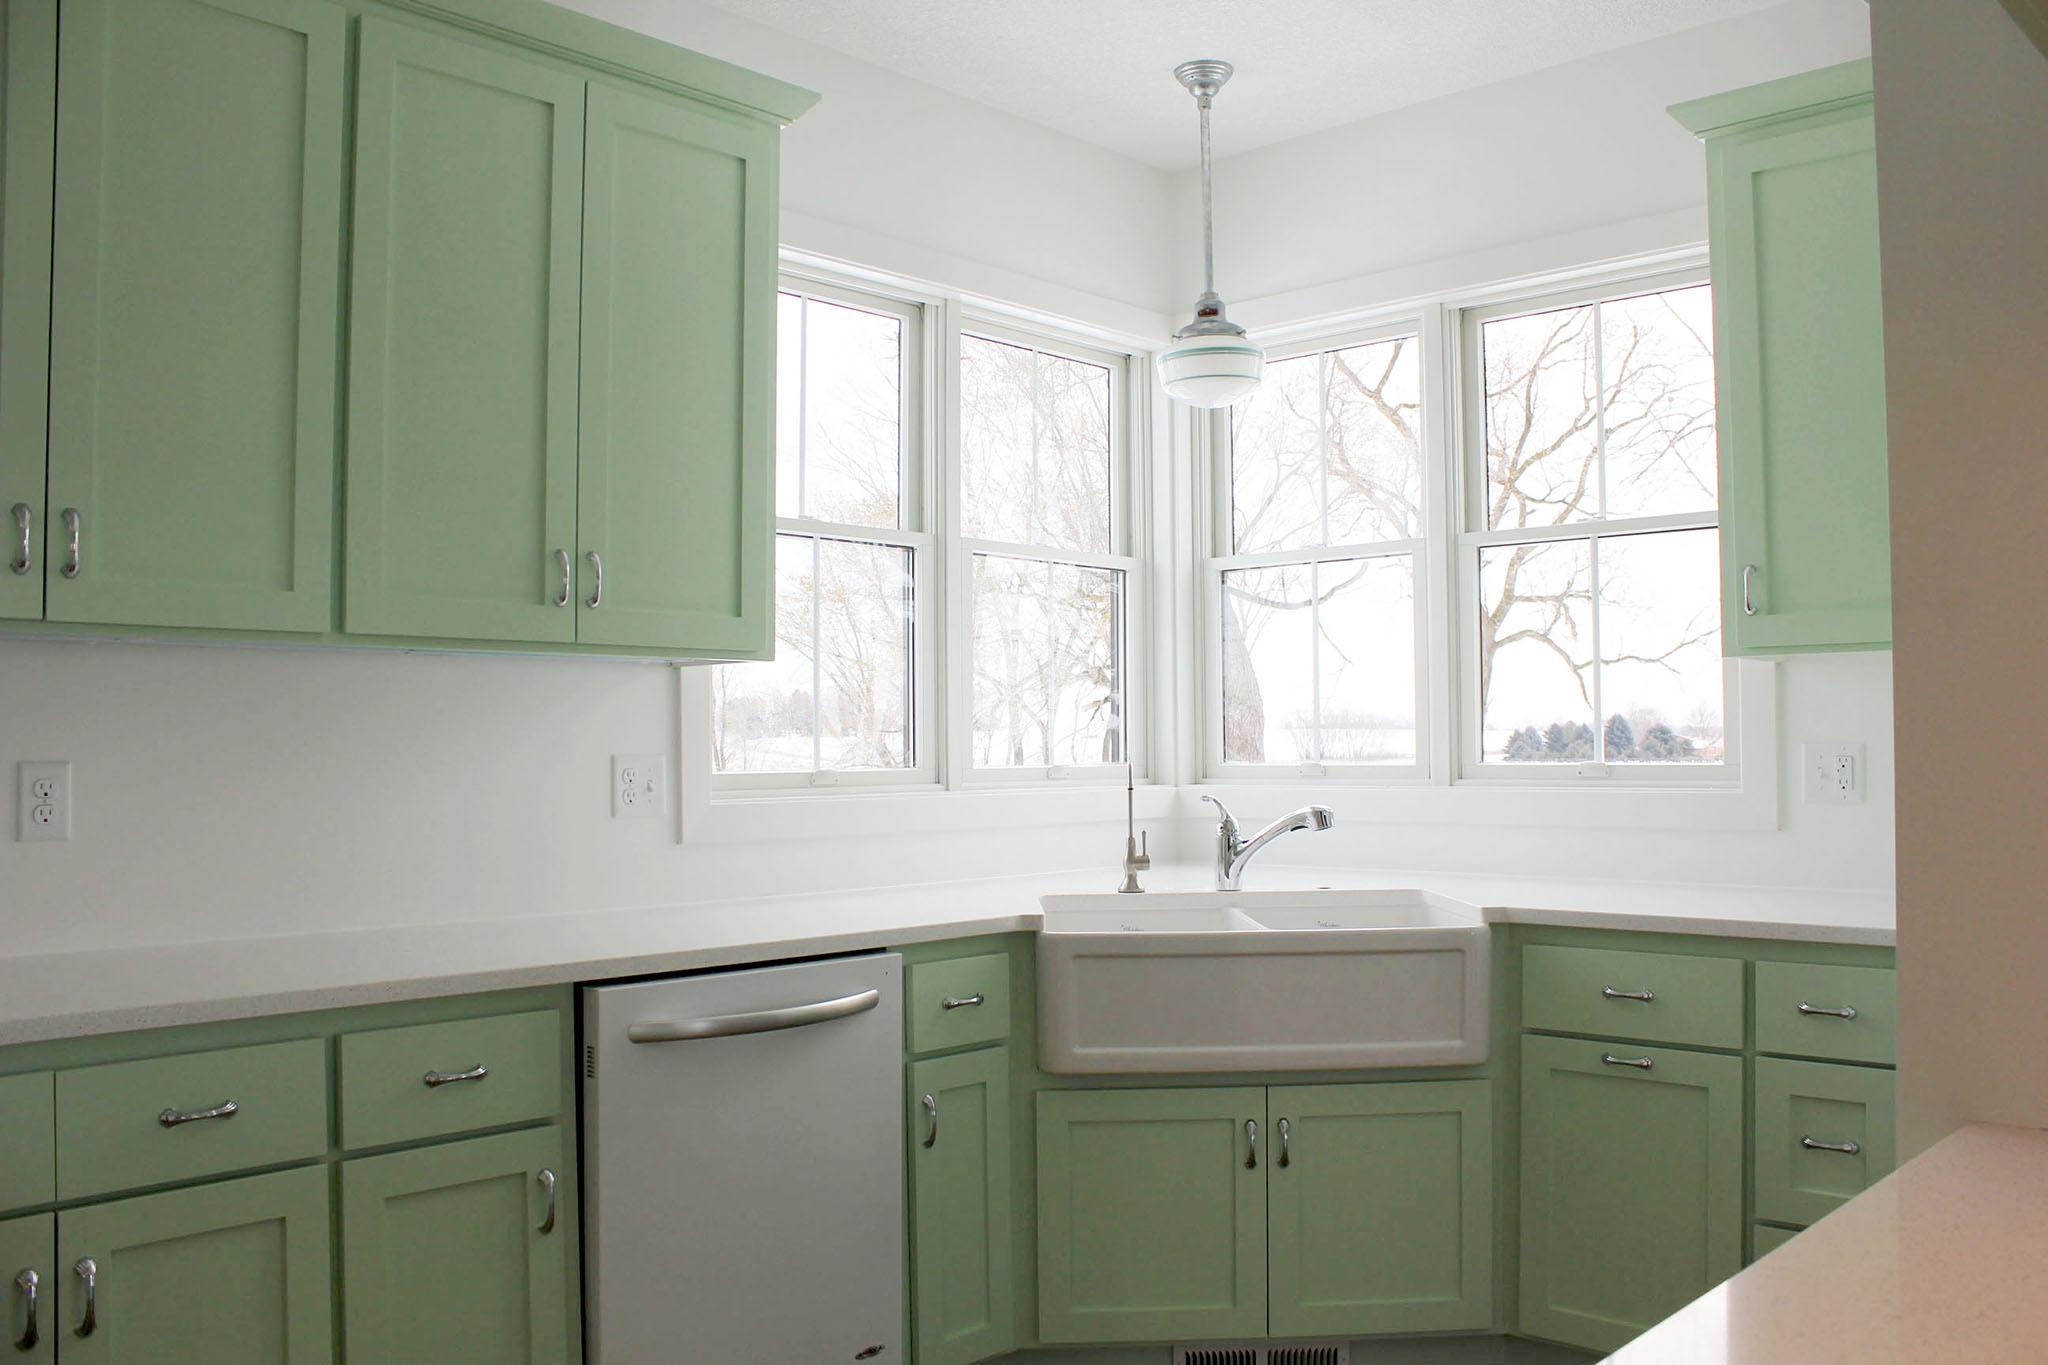 Vintage kitchen cabinets with cast iron farmhouse apron sink